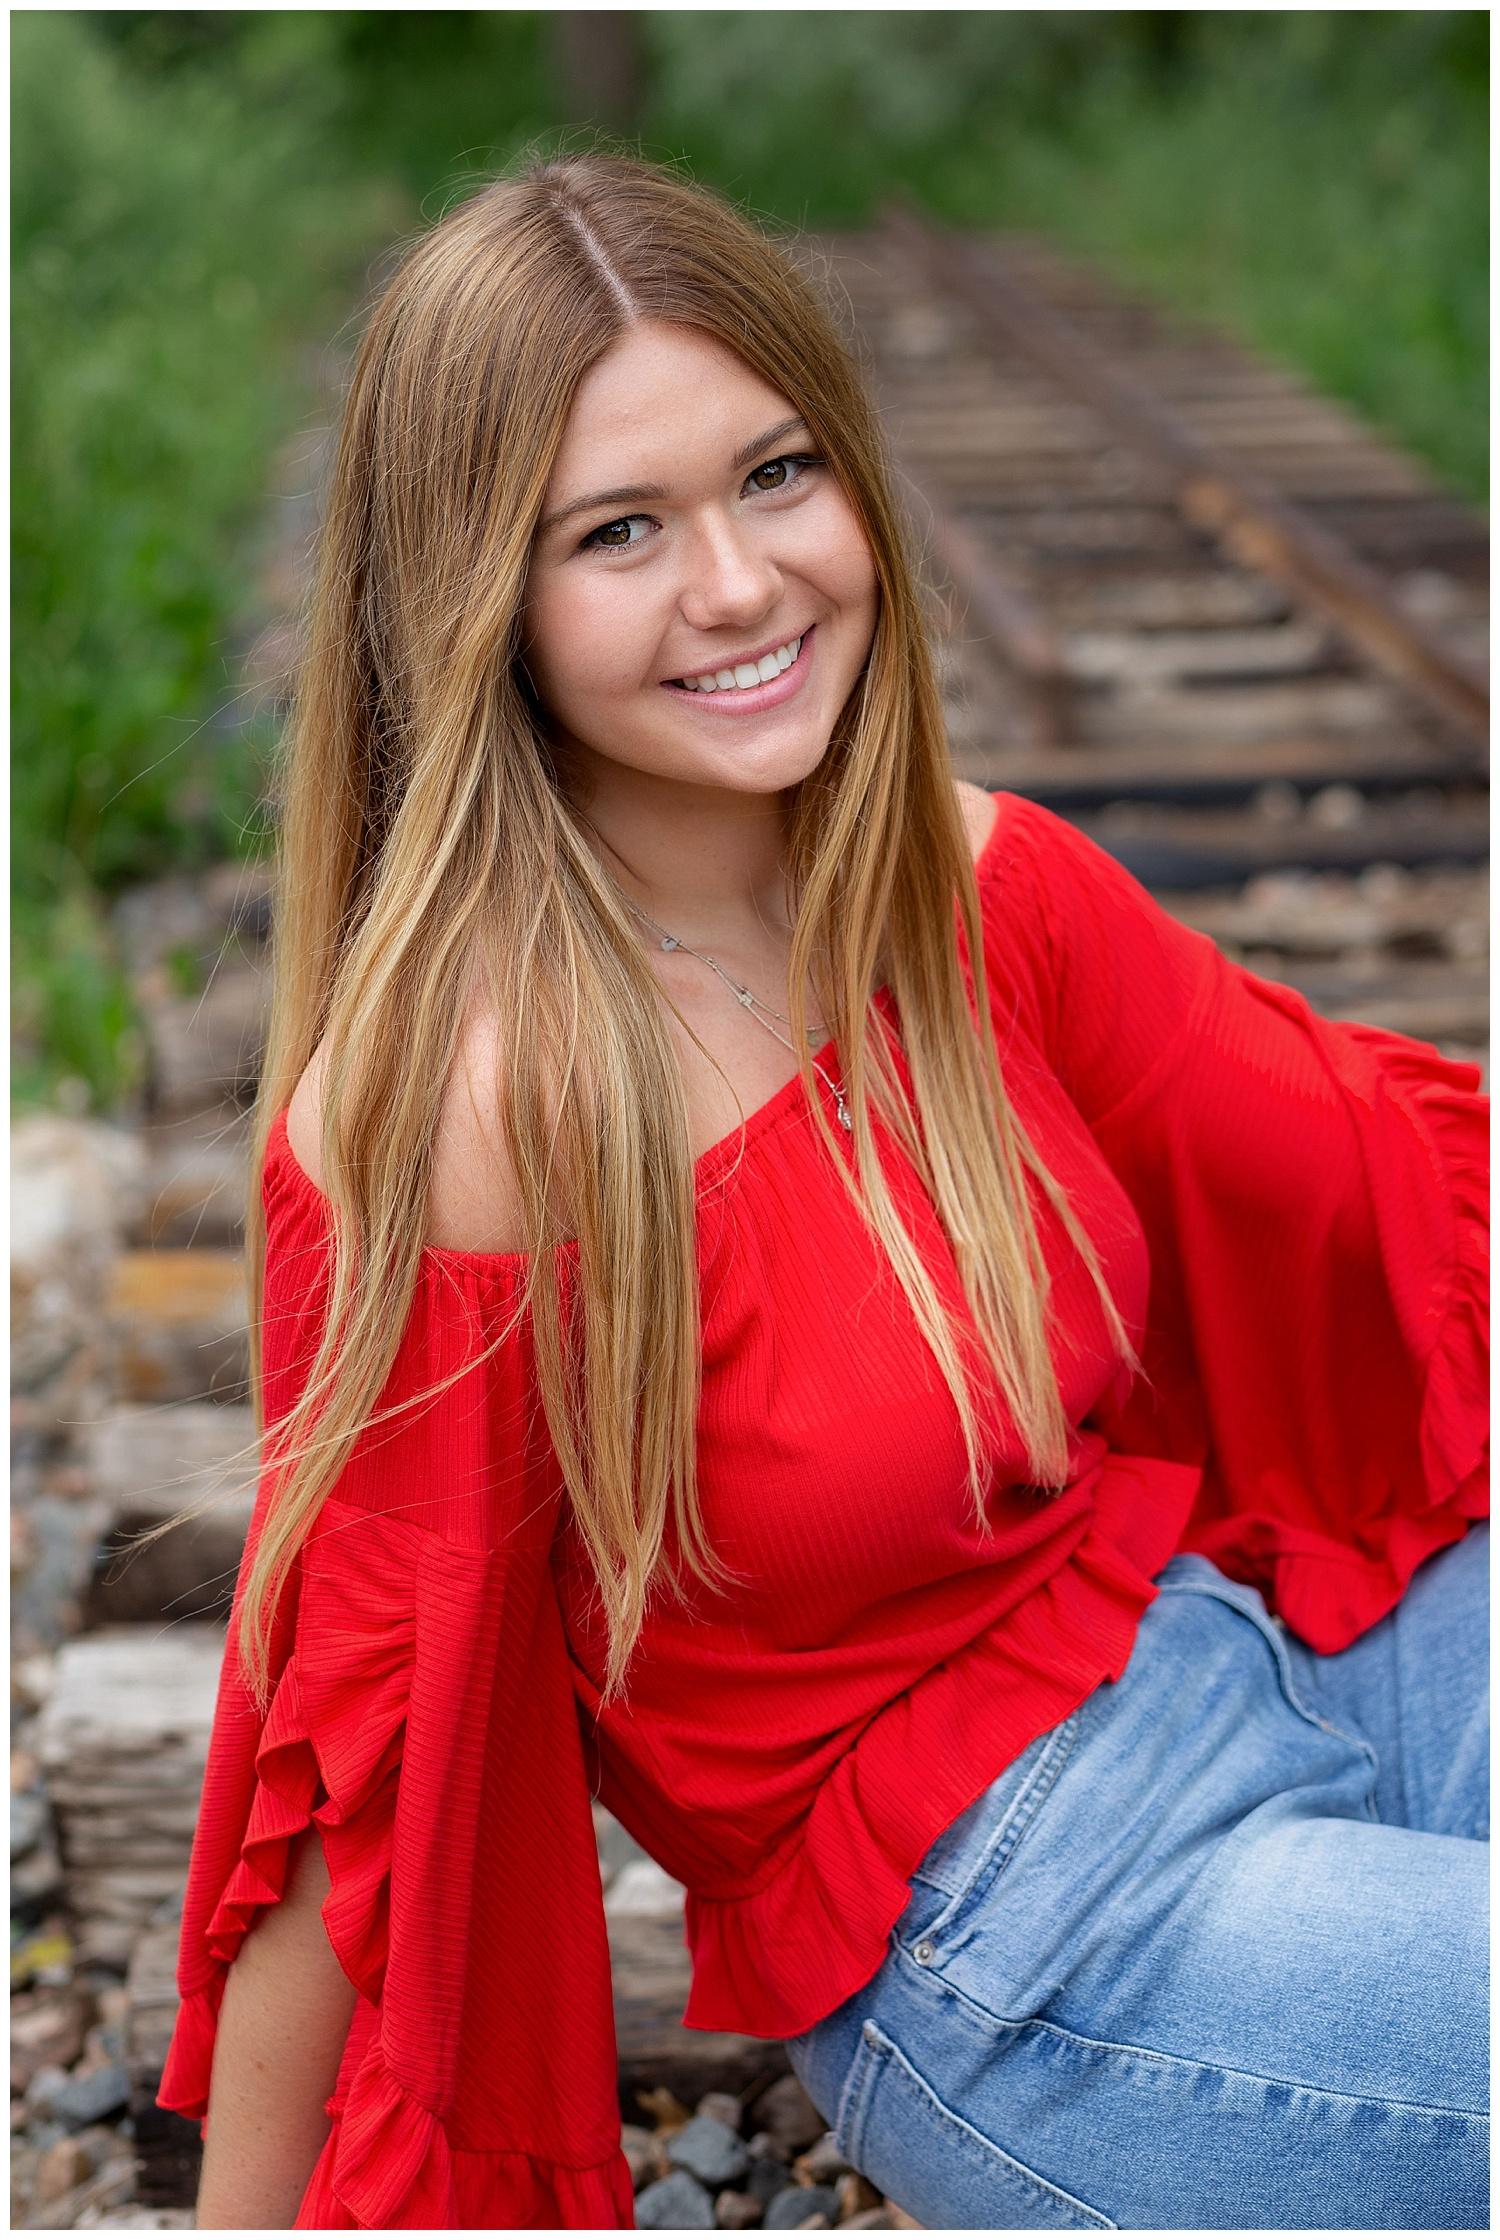 Ayesha - Highlands Ranch High School - Class of 2020